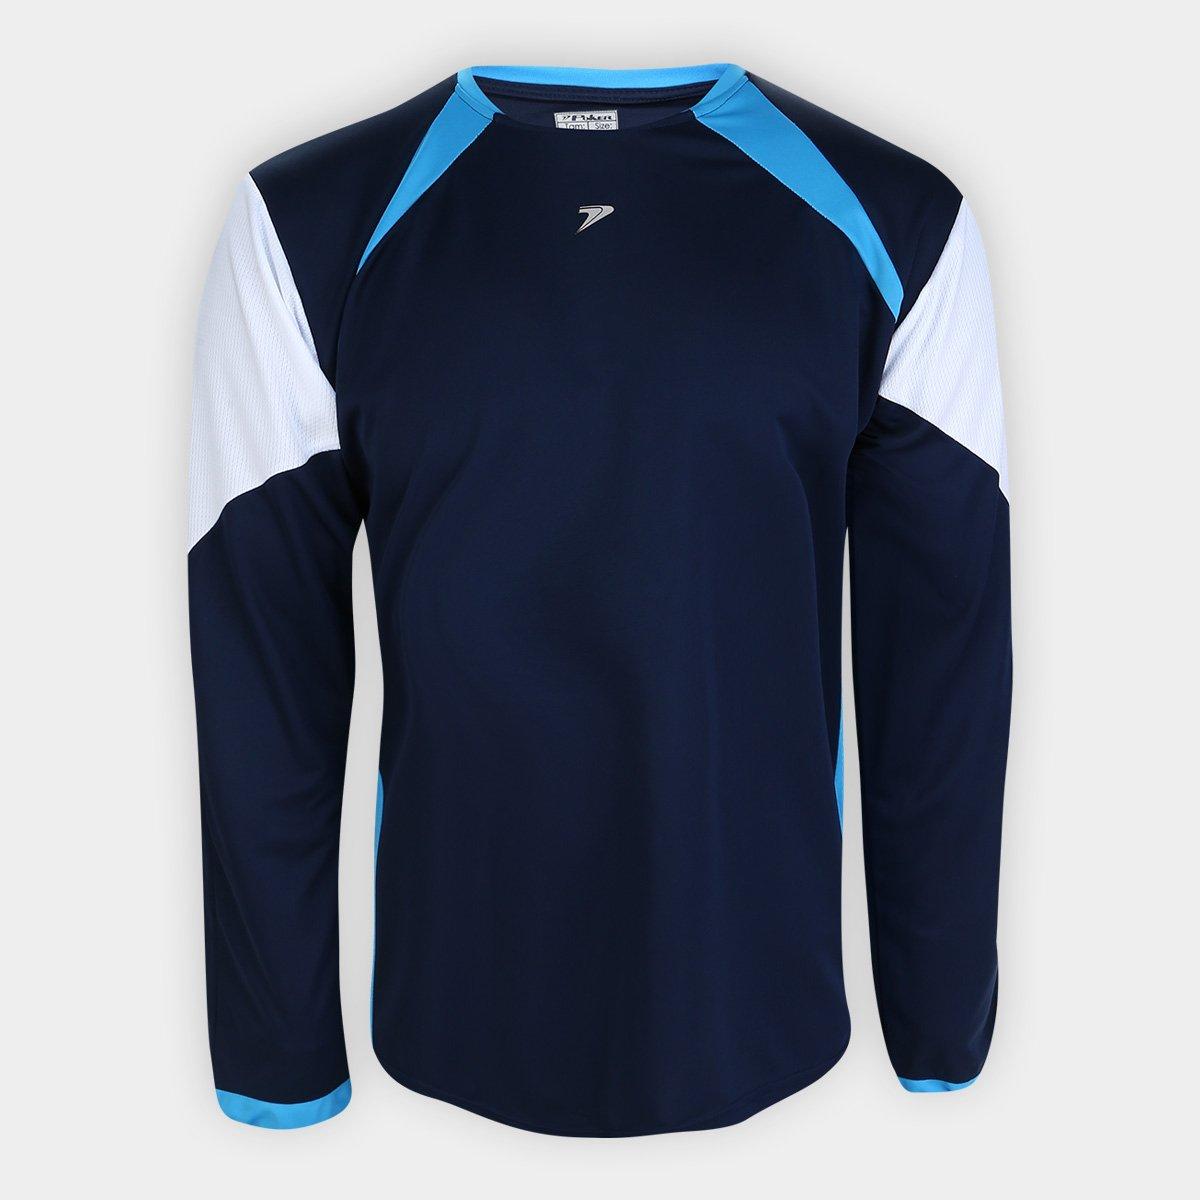 Camisa de Goleiro Poker Roma Manga Longa - Adulto - Marinho/Azul